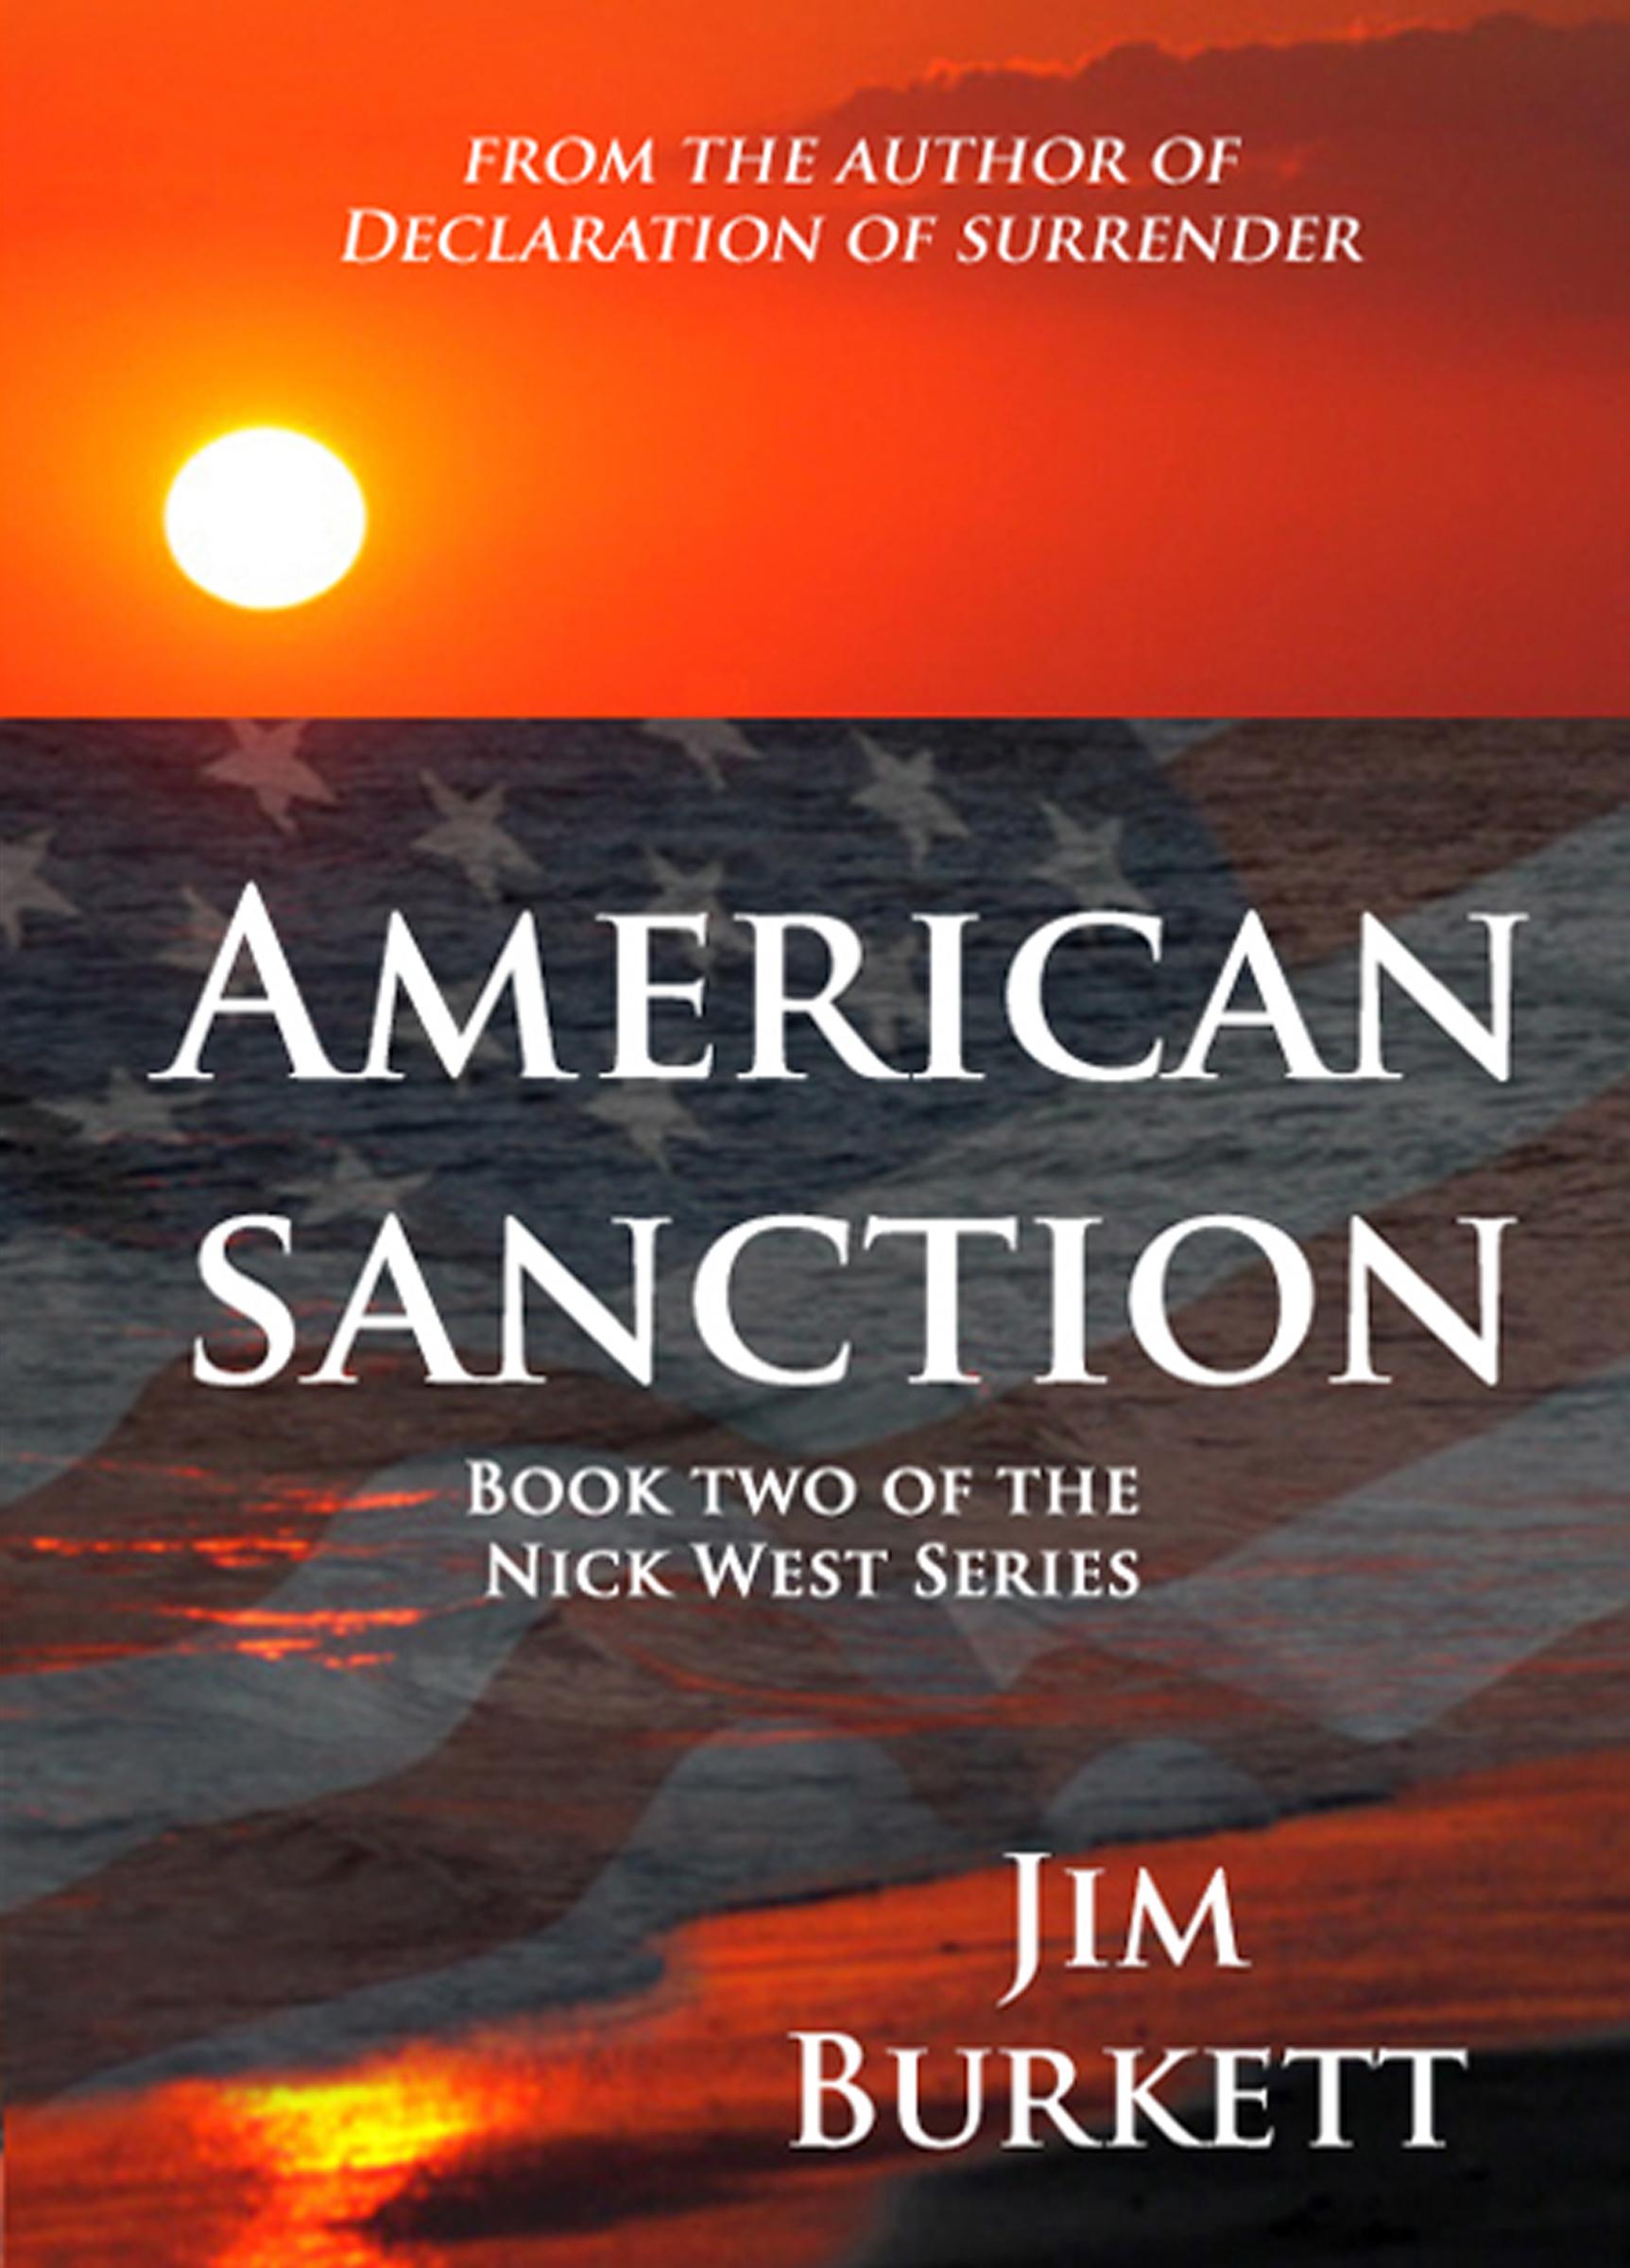 American Sanction